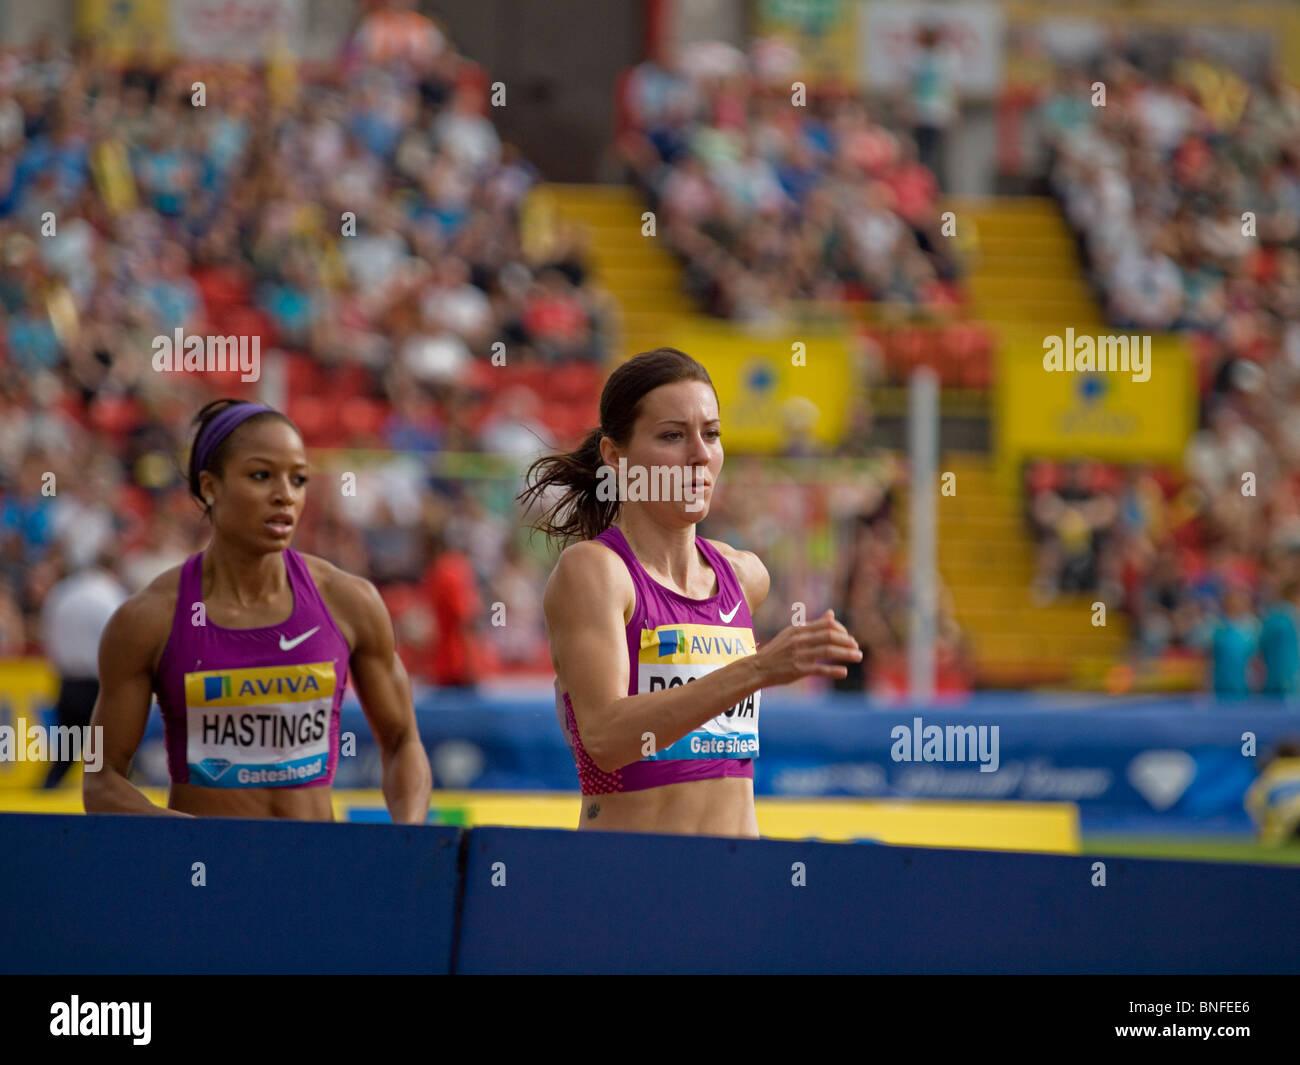 Natasha Hastings and Denisa Rosolova during 400 for women in IAAF Diamond League in Gateshead 2010 - Stock Image